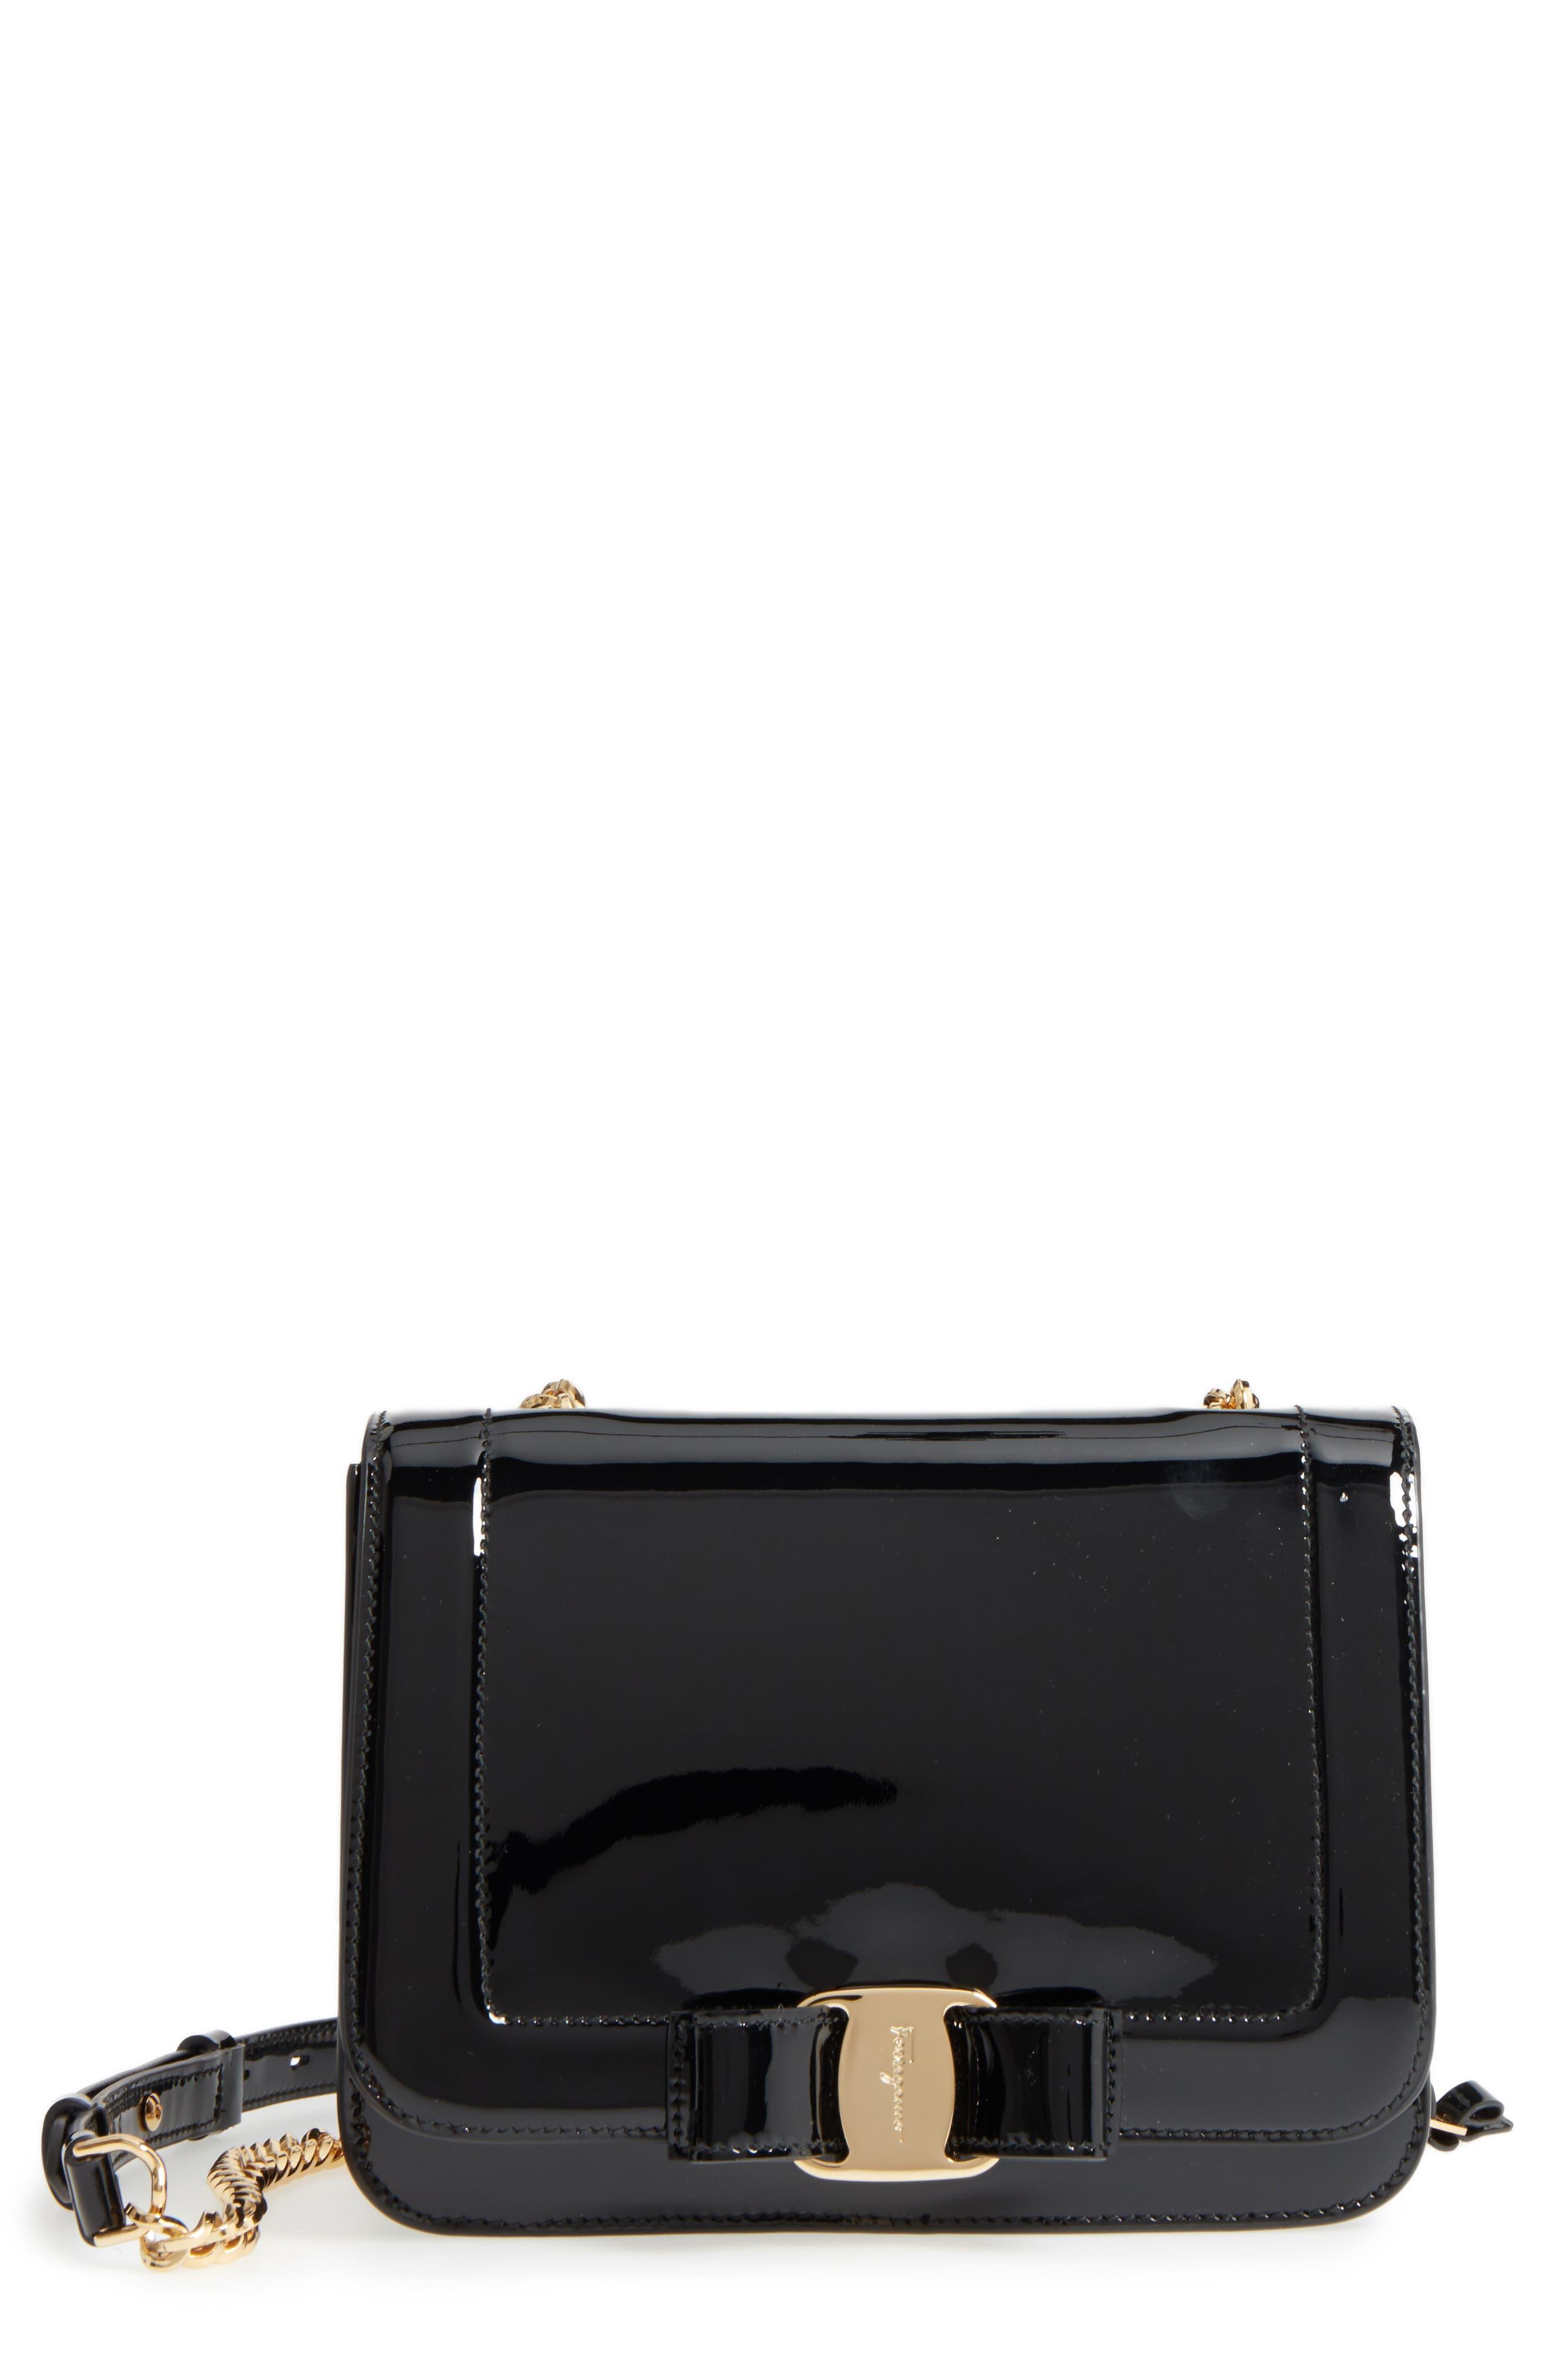 Vara Patent Leather Shoulder Bag,                         Main,                         color, NERO/ BONBON